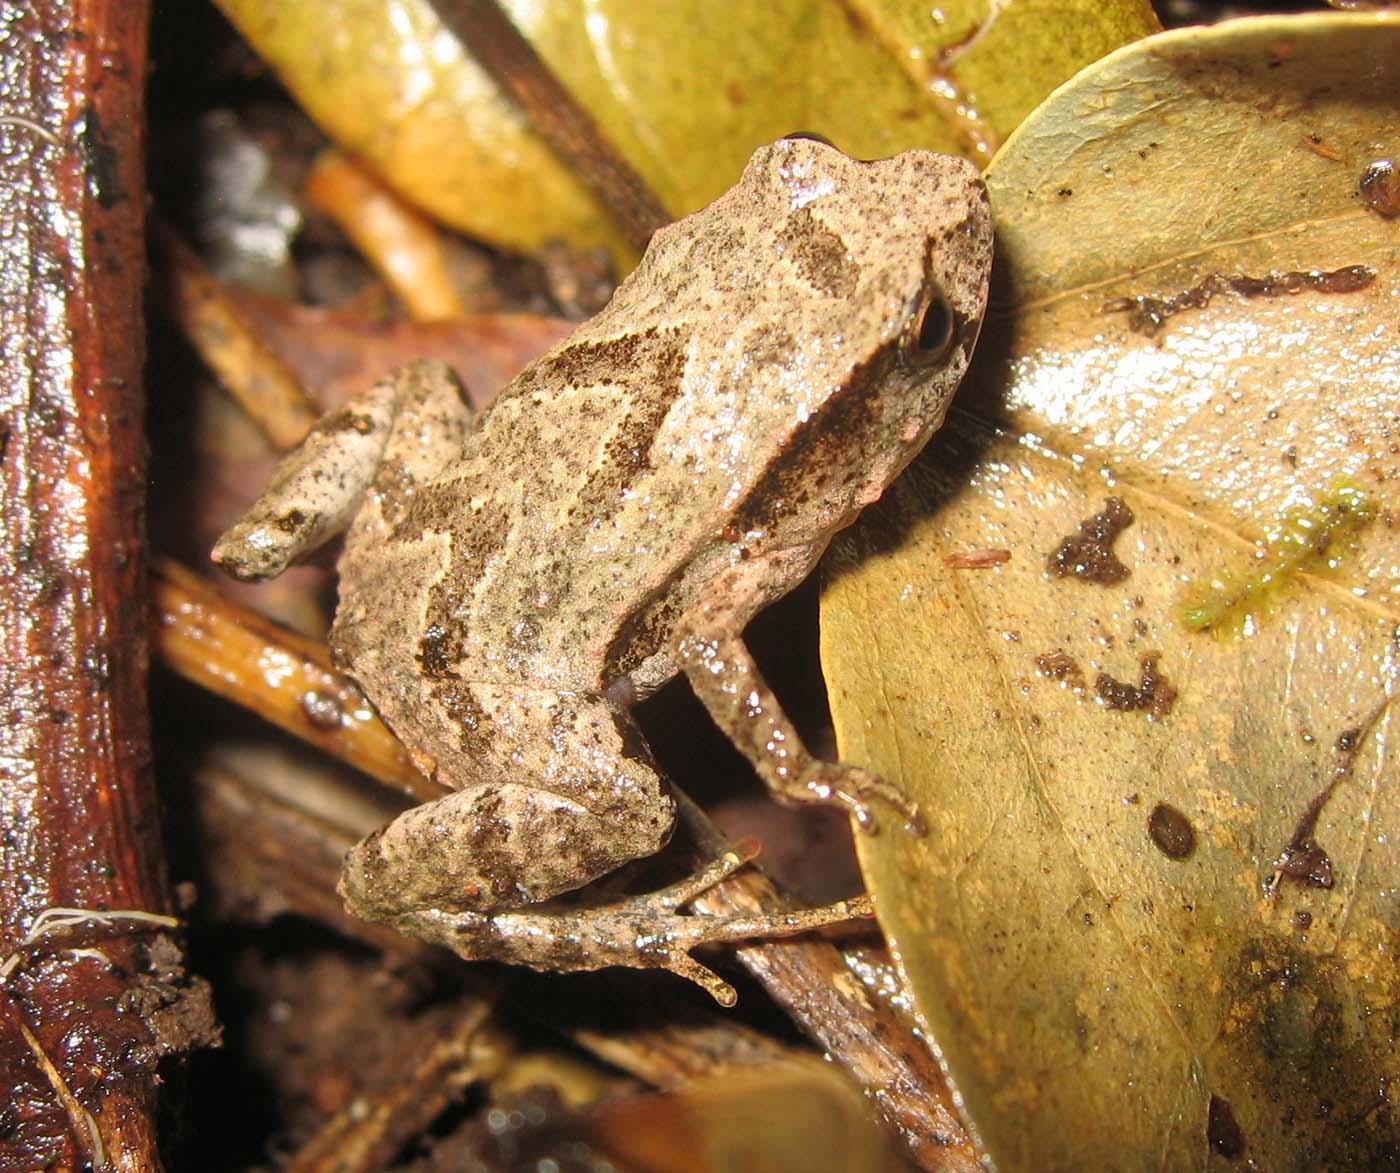 Assa darlingtoni Marsupial Frog